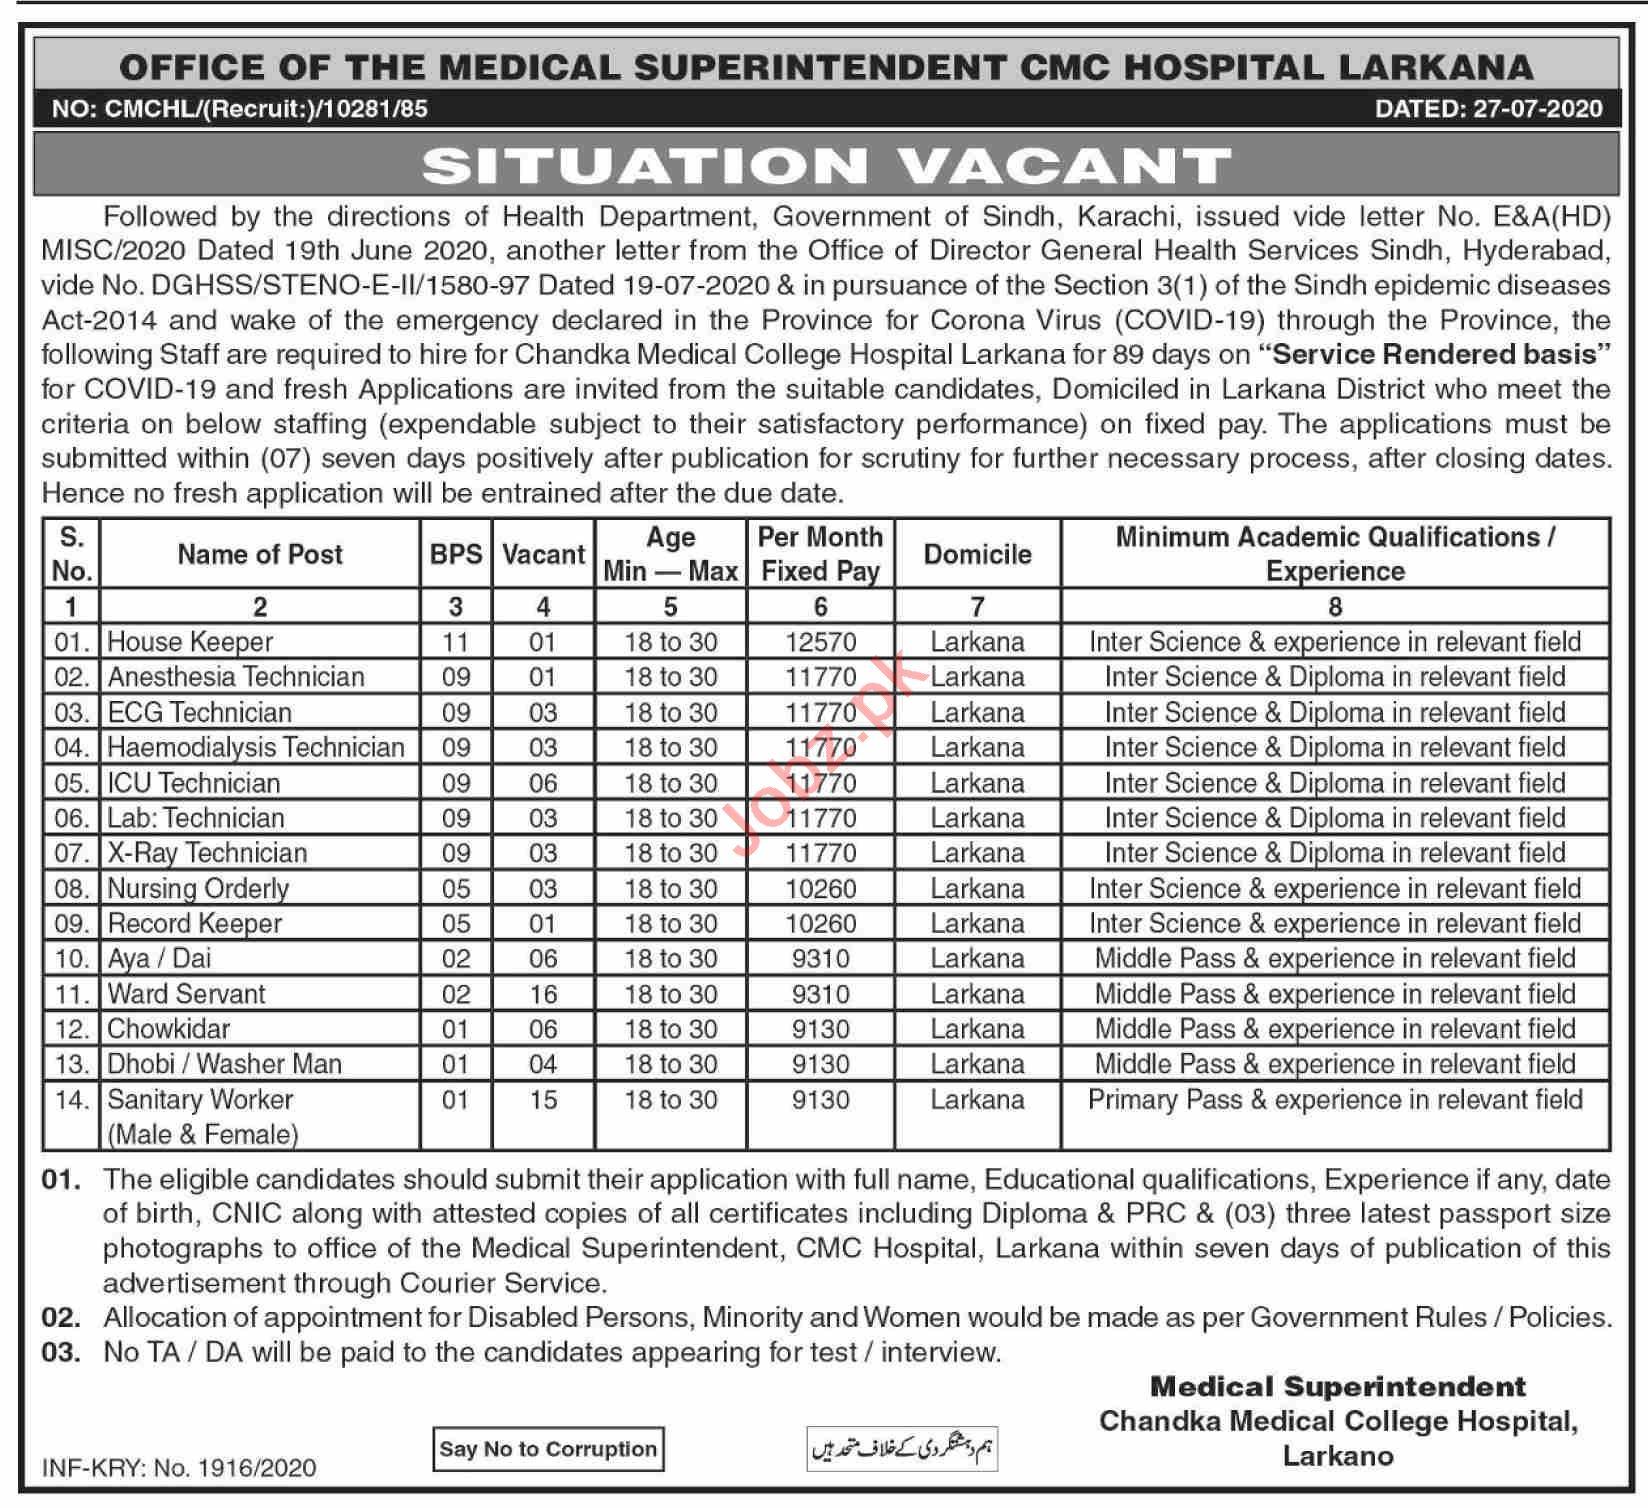 Chandka Medical College CMC Hospital Larkana Jobs 2020